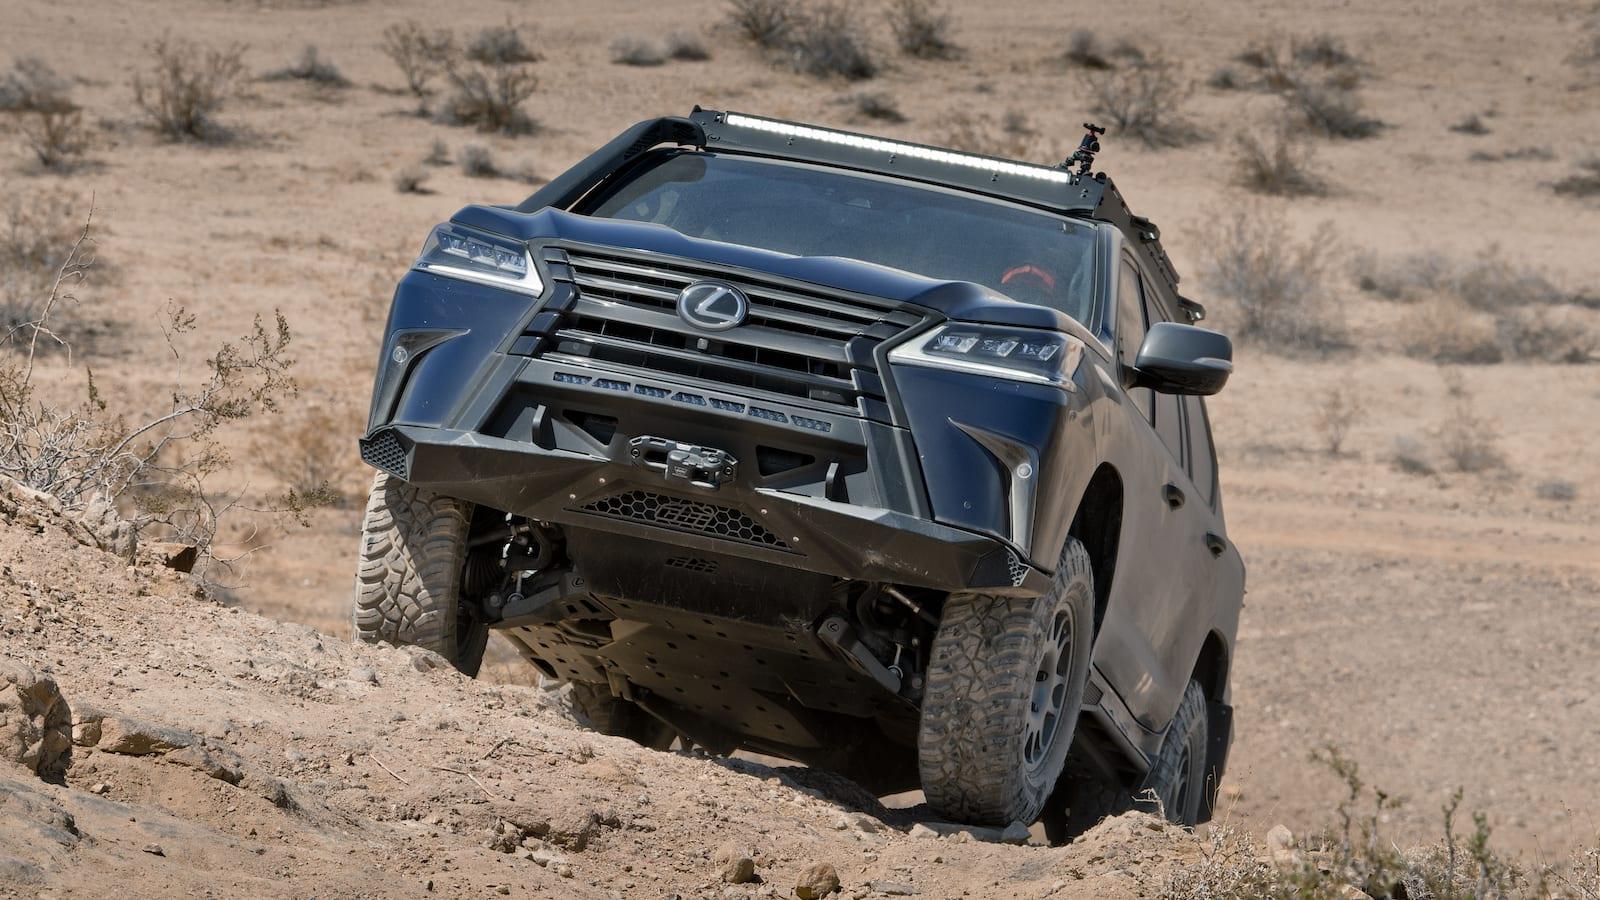 Término Lexus J201   Adelantar en terrenos de marca inexplorados